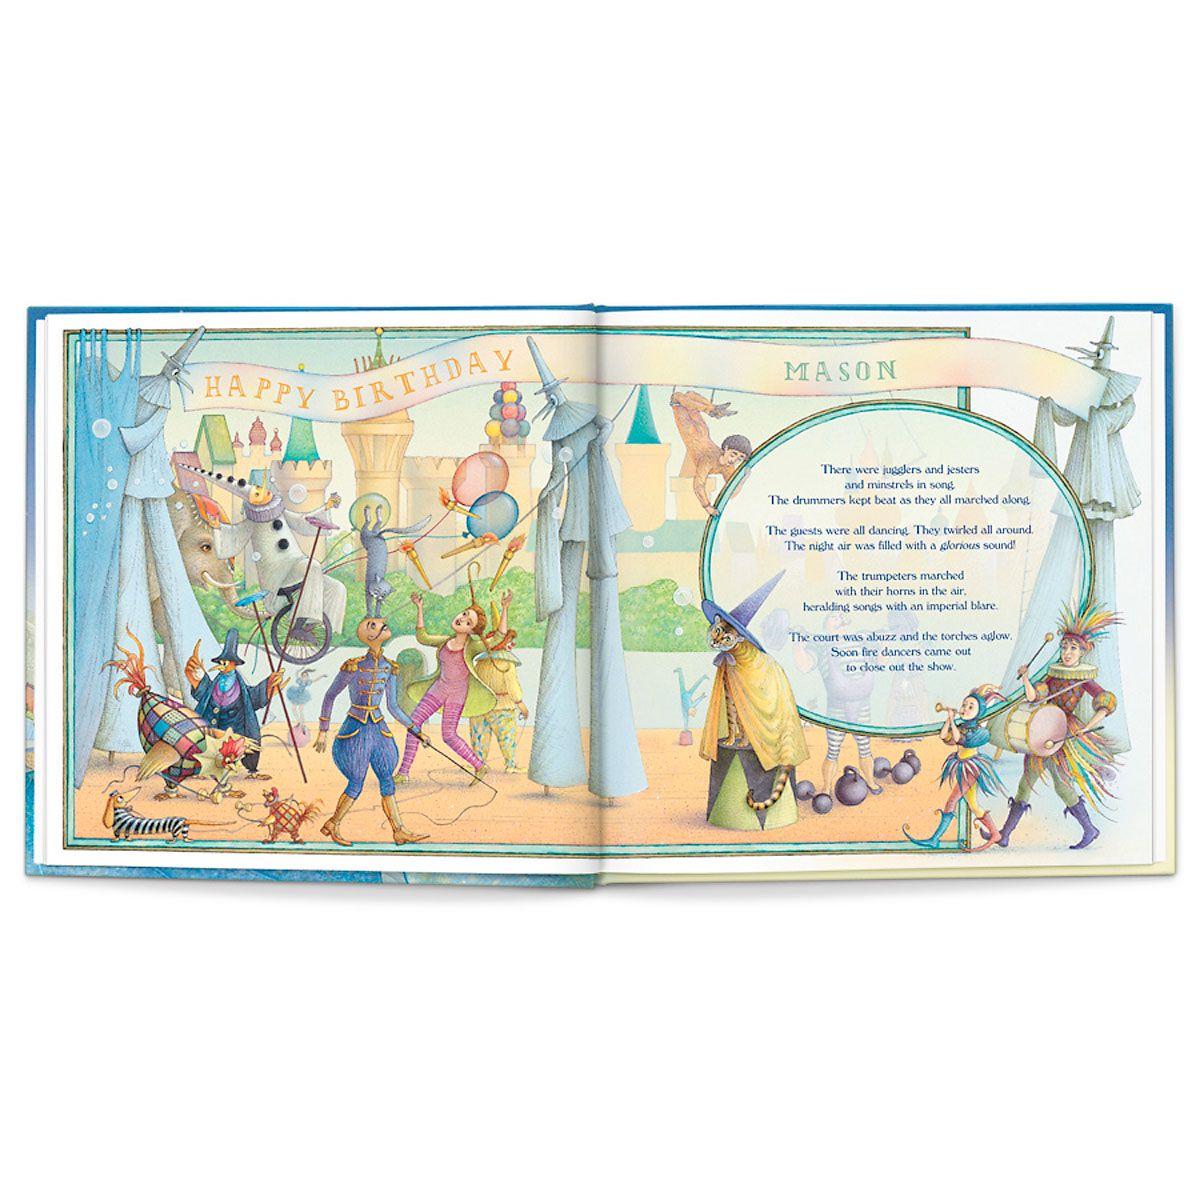 Personalized My Royal Birthday Dragon Adventure Children's Book